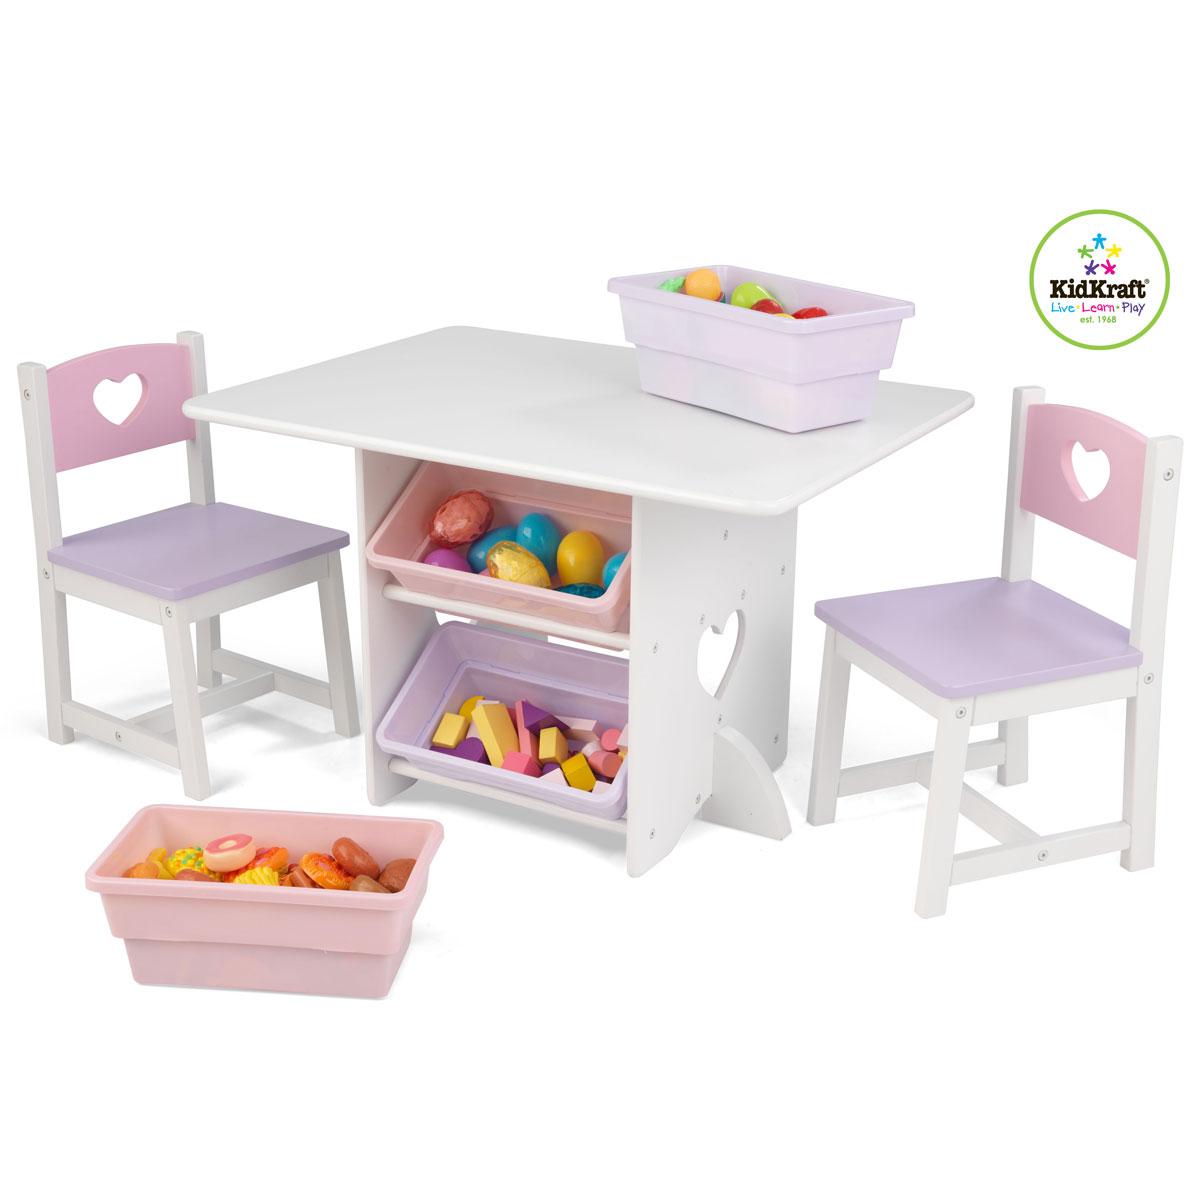 Kidkraft 26913 Heart Set Tavolo E Sedia Per Bambini Con Cestelli #B29419 1200 1200 Ikea Tavoli E Sedie Da Bar